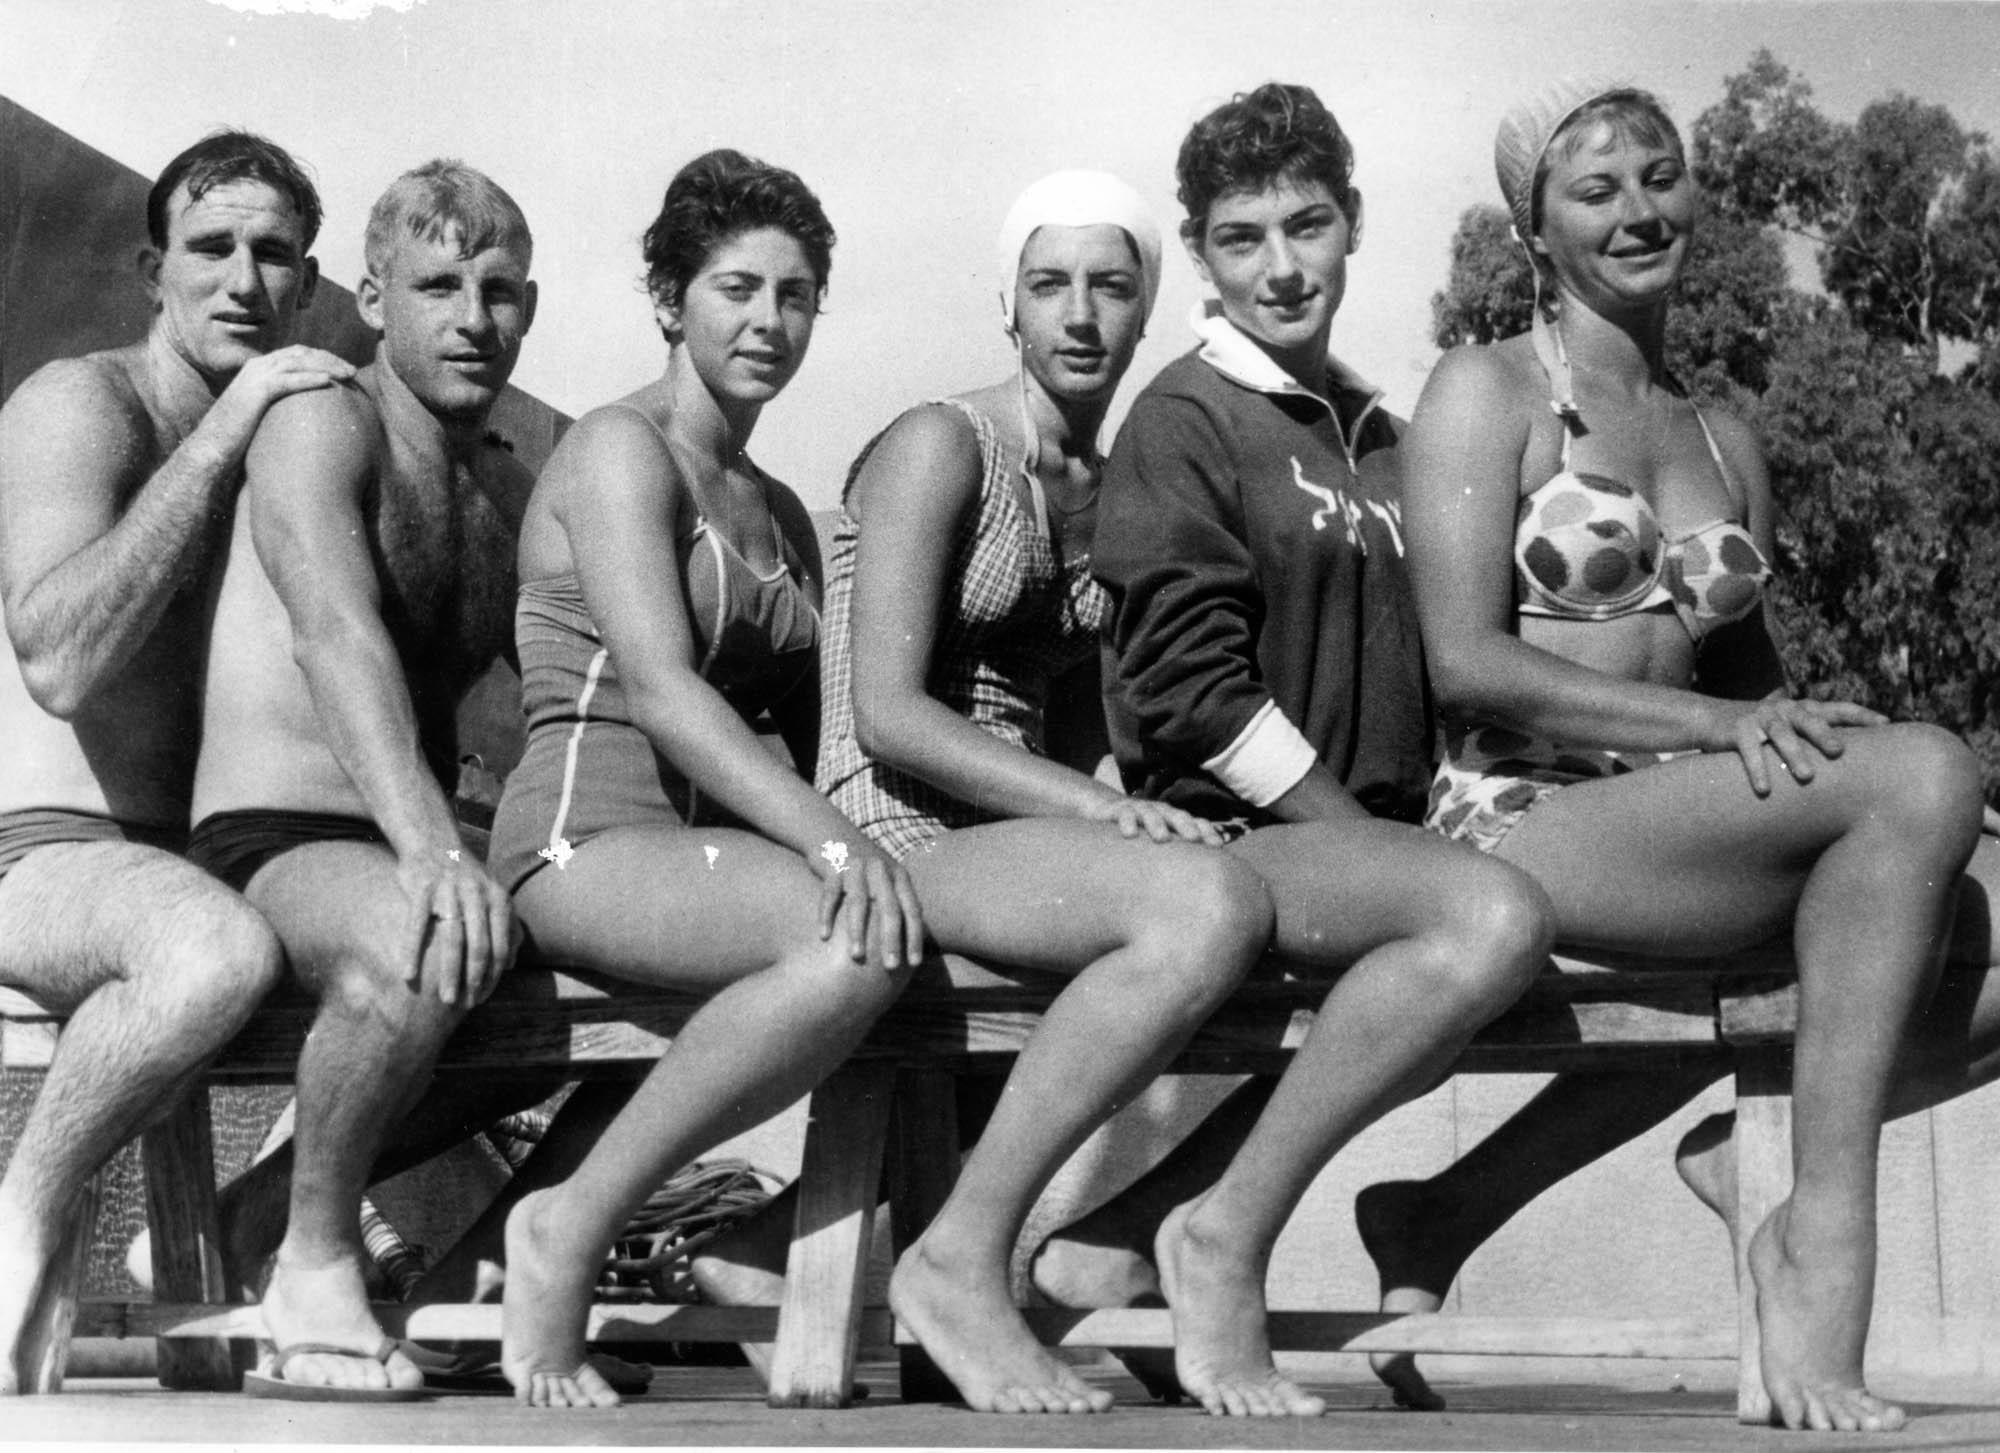 File:Israel elite swimmers March 1959 jpg - Wikimedia Commons